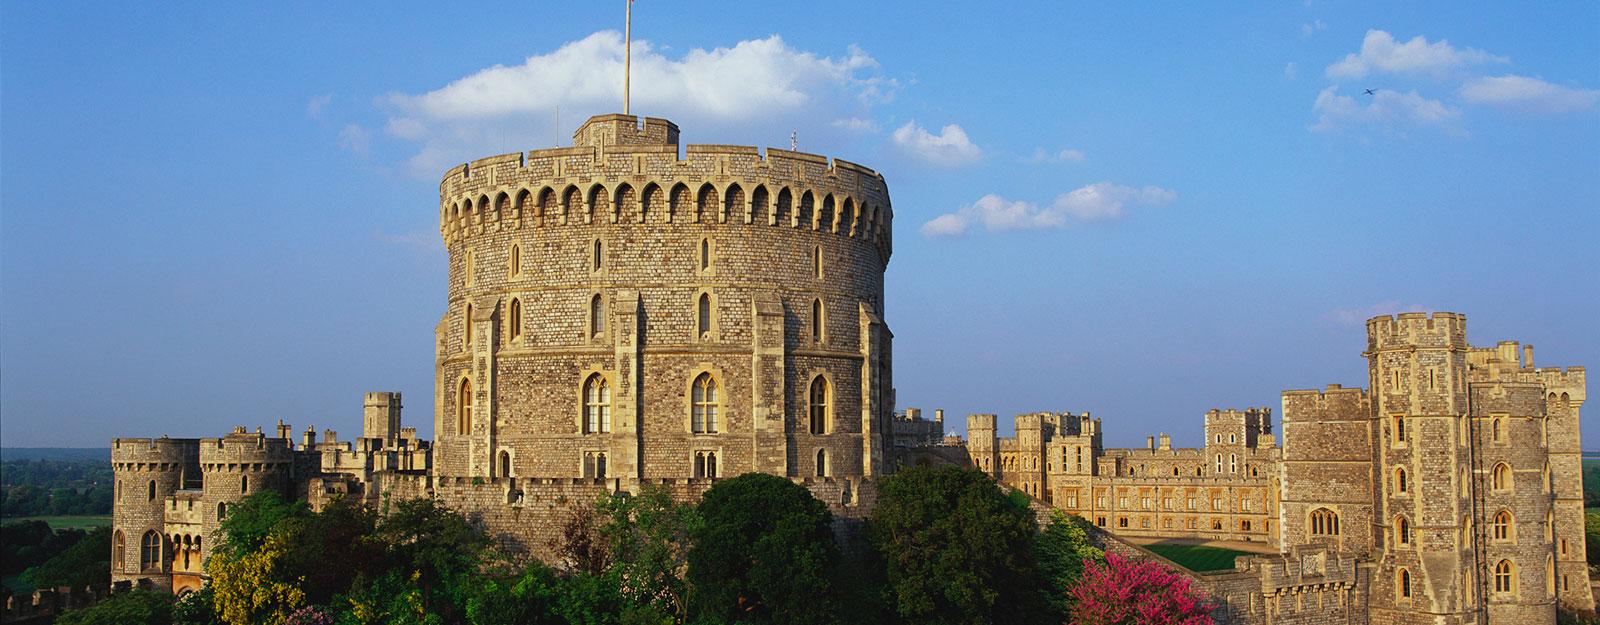 Palace clipart castle on cloud. Windsor